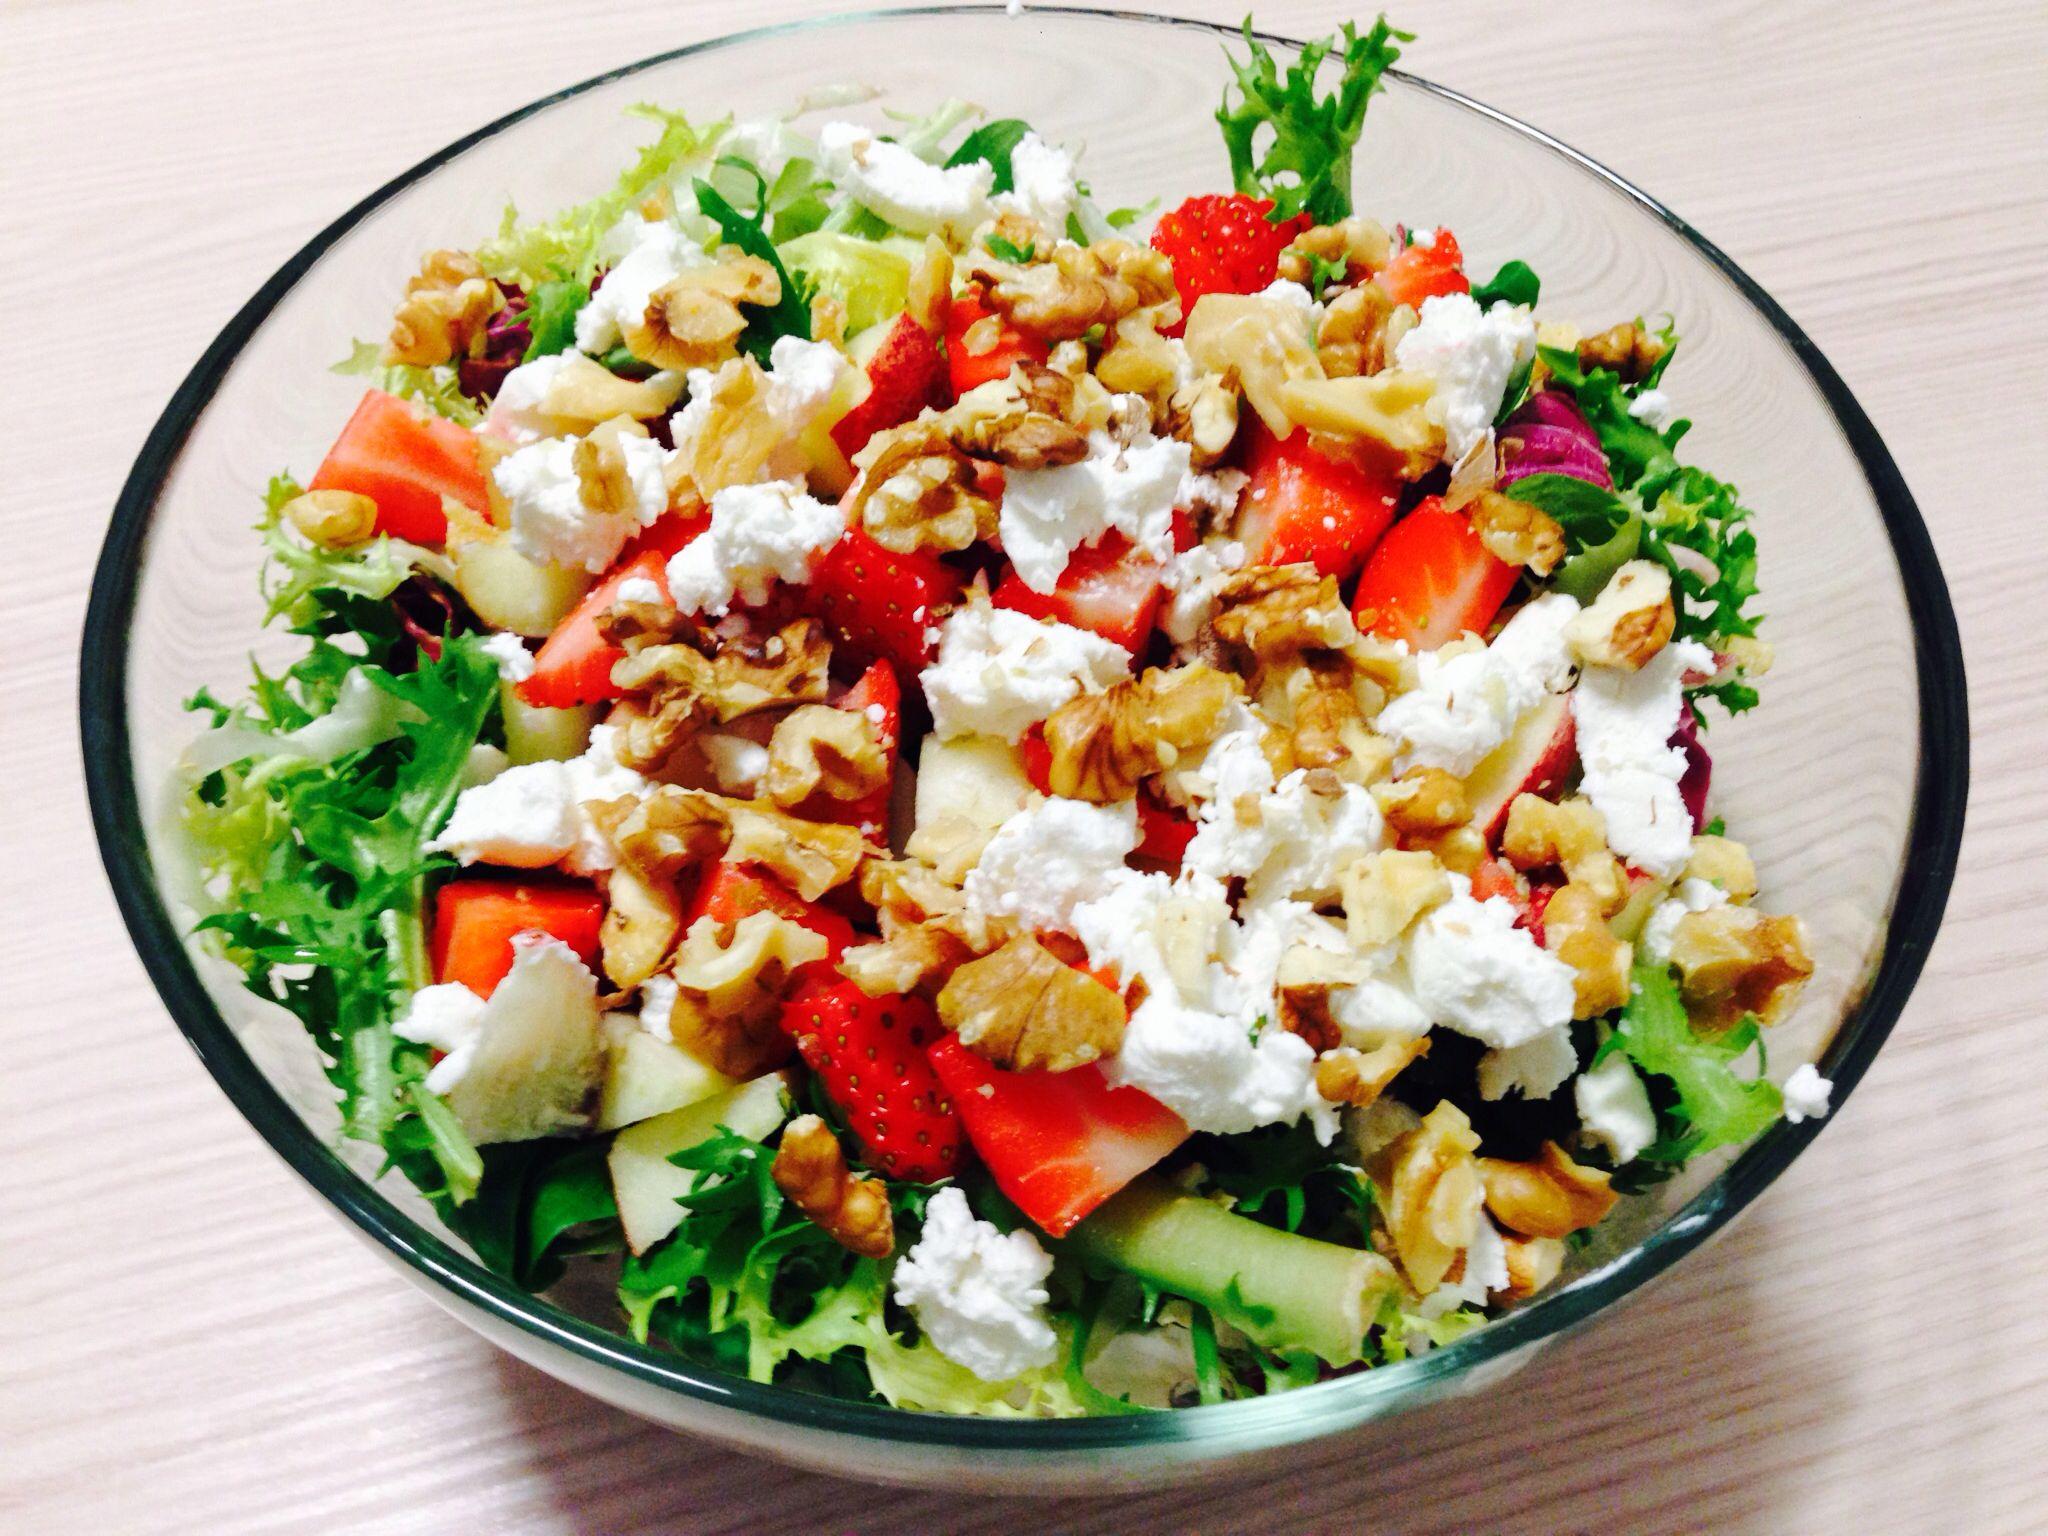 Goat cheese salad !  Goat cheese, strawberries, apple, walnuts and green salad Olive oil,vinegar, lemon, honey, salt and pepper